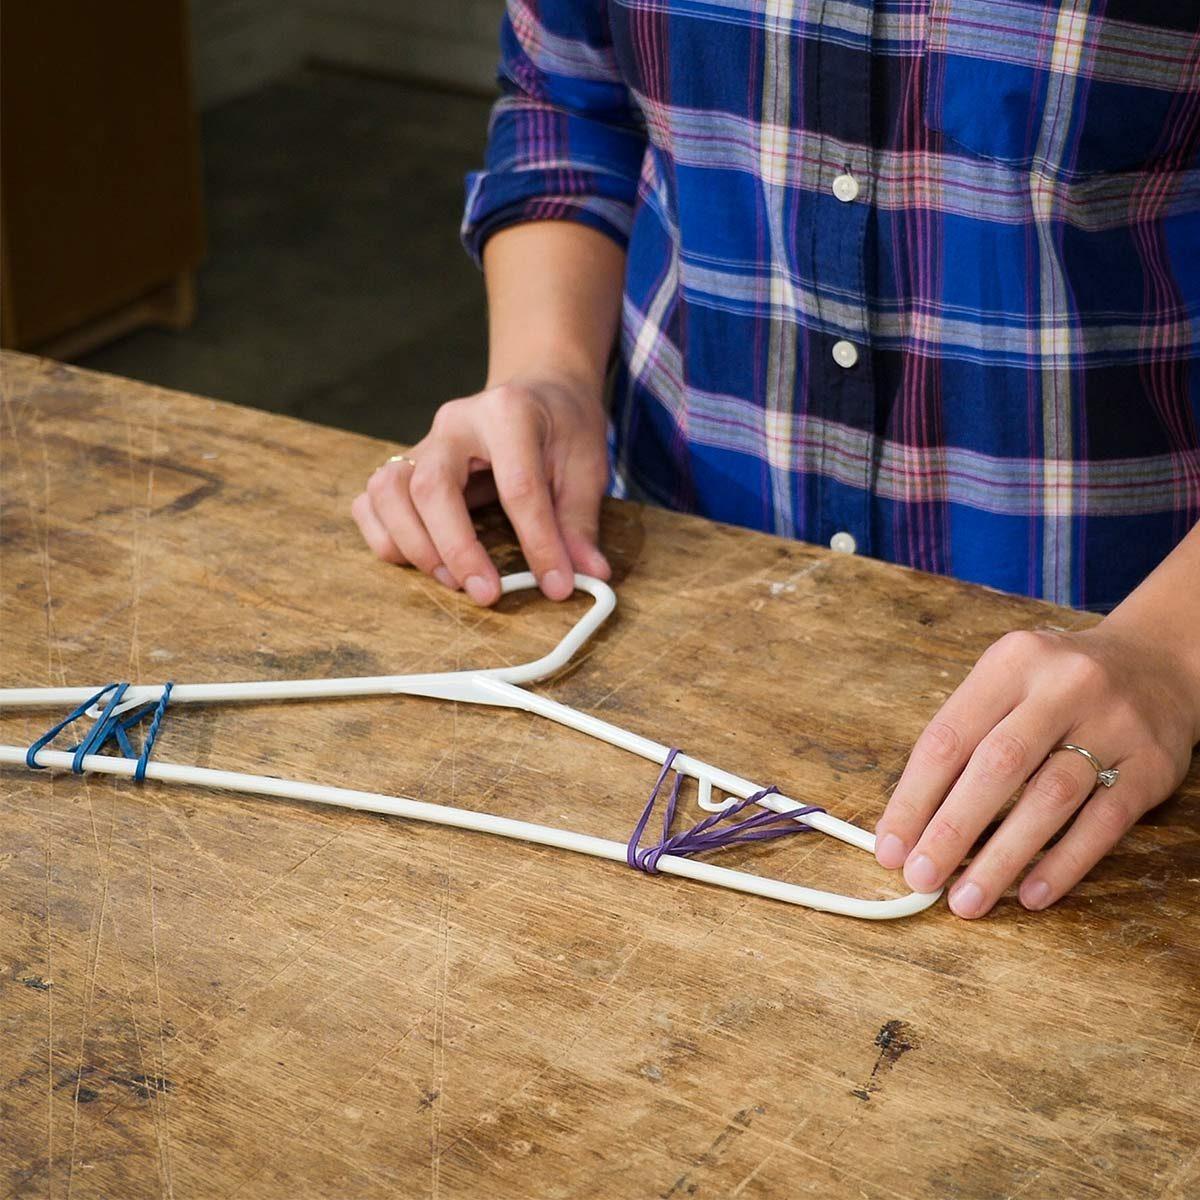 wrap rubber bands around hanger